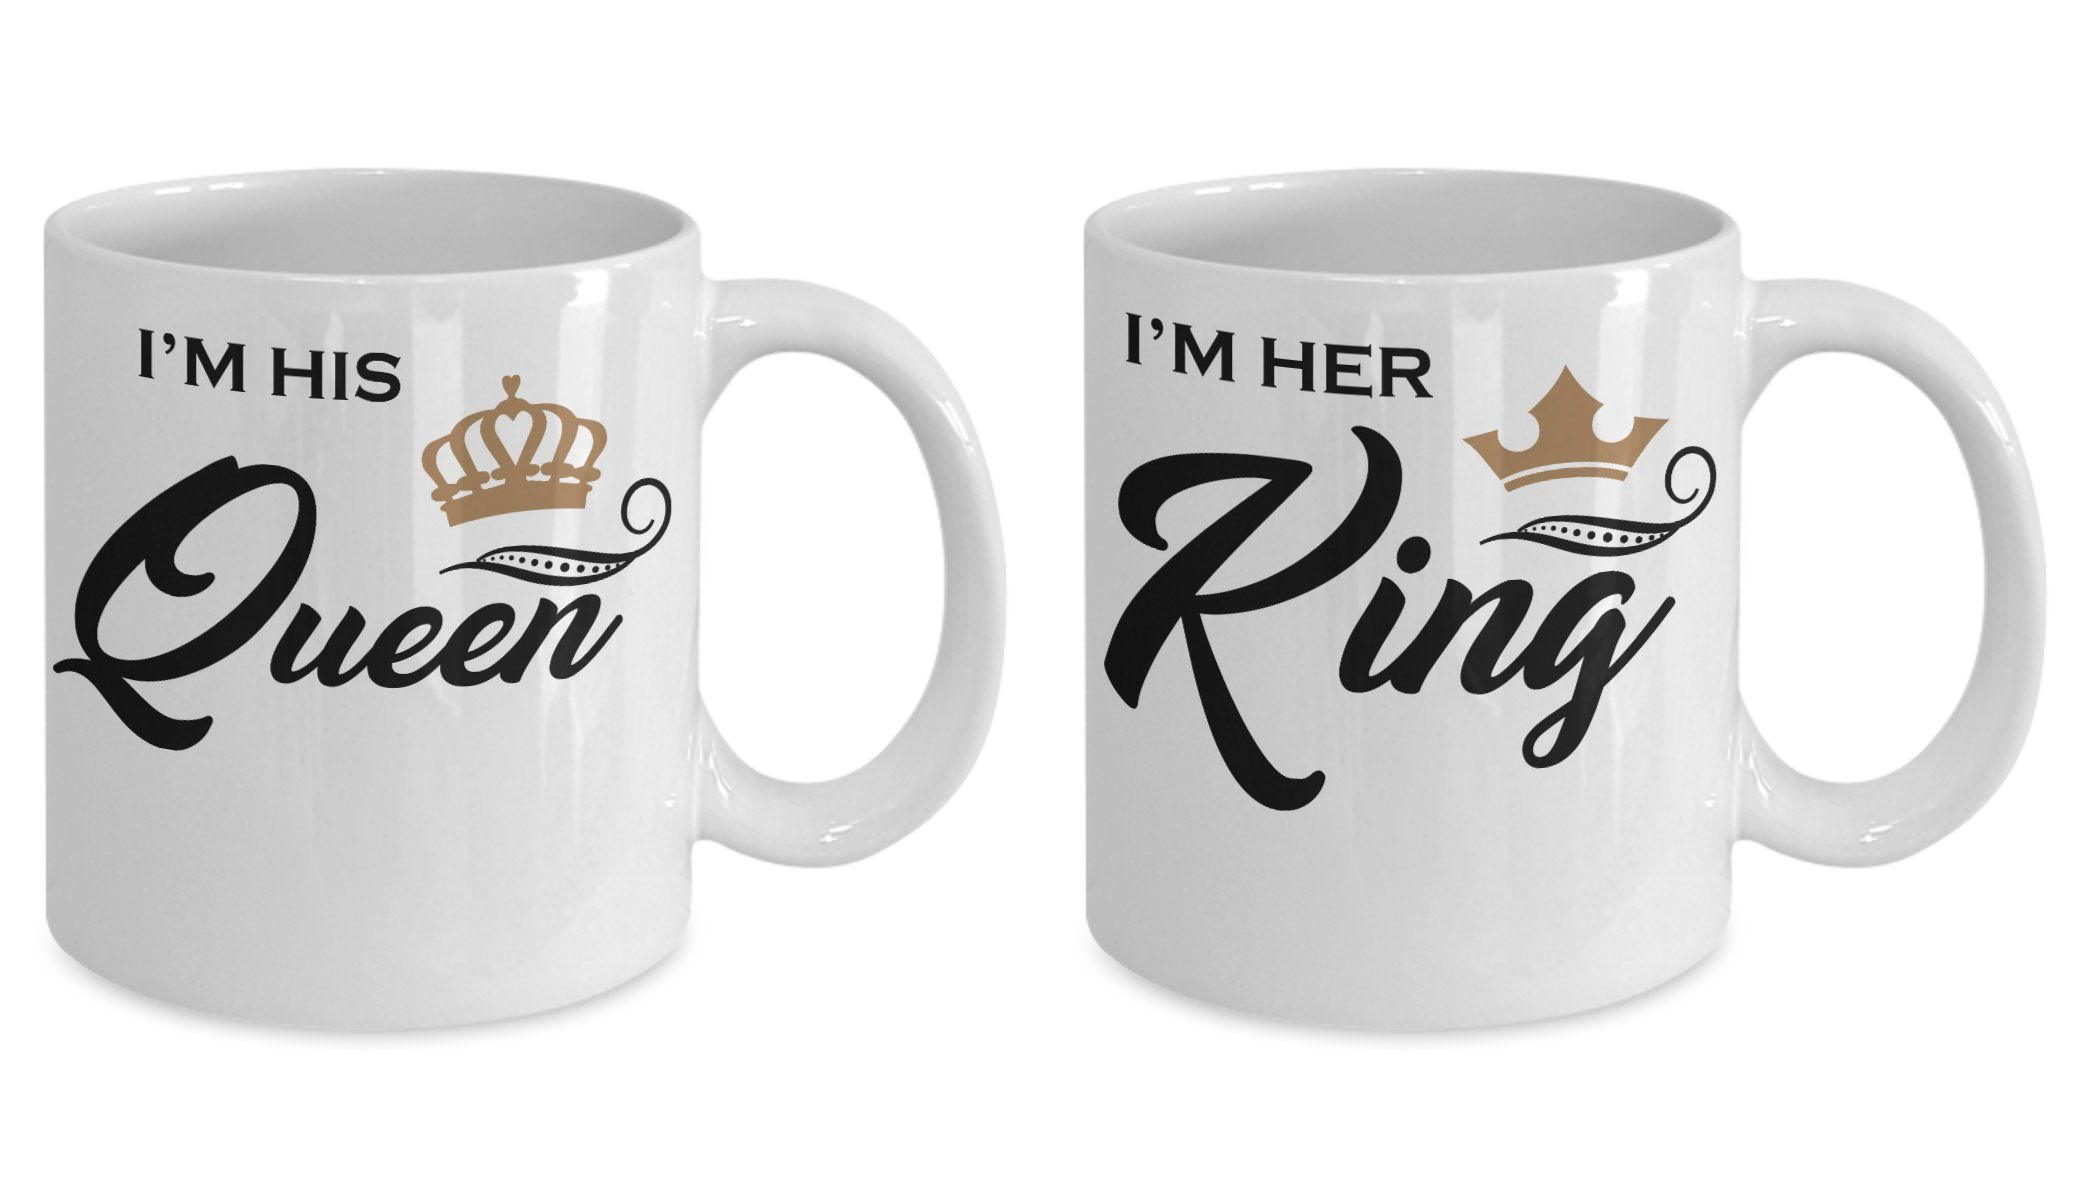 Couples coffee mug wedding gift engagement gift for her